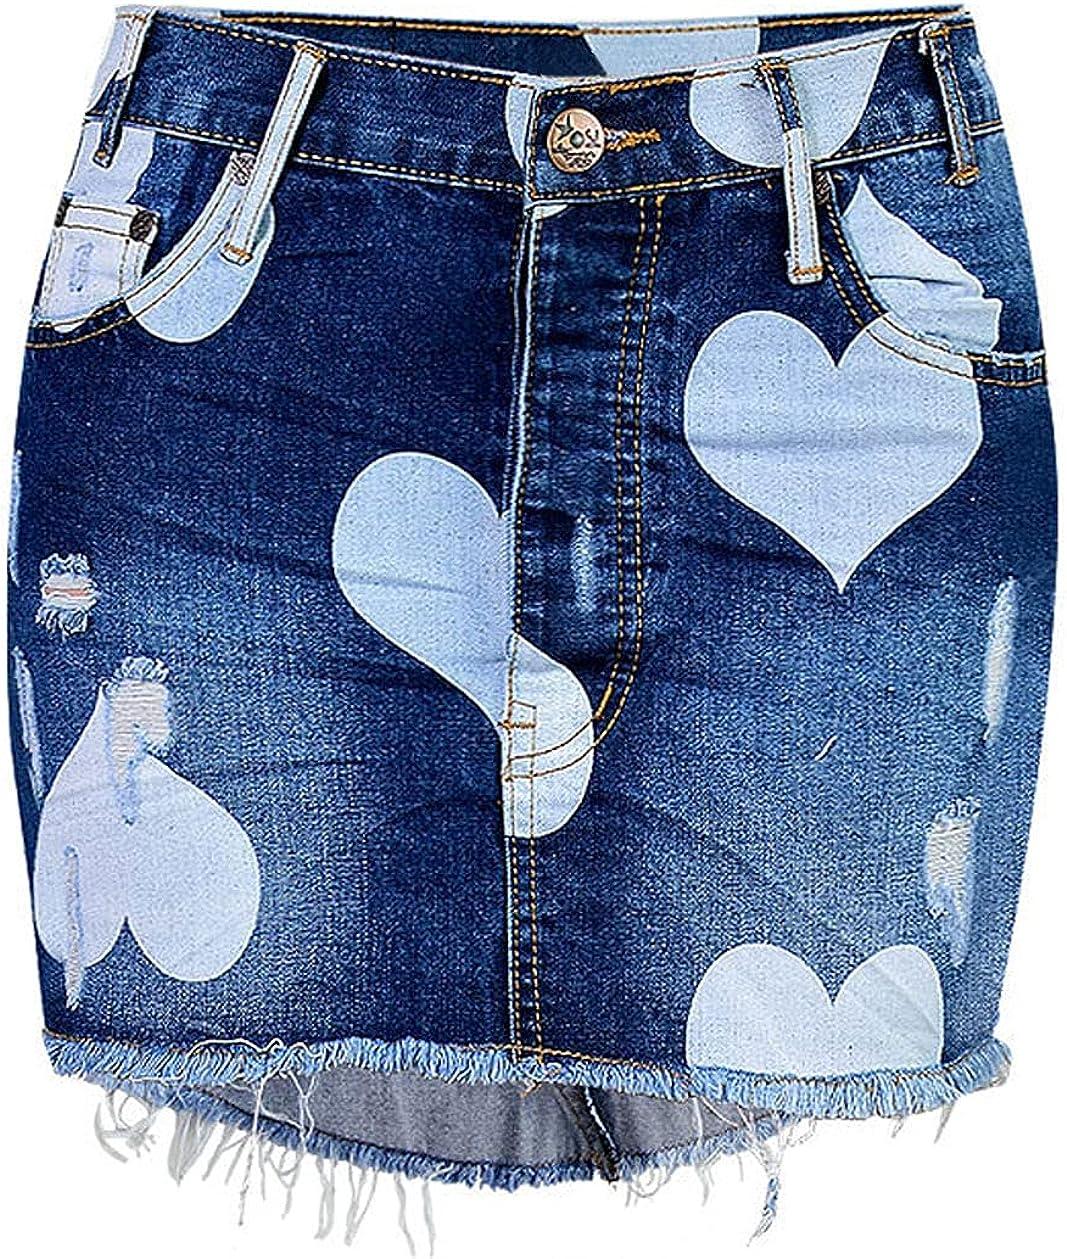 chouyatou Women's Casual Heart Print Mid-Rise Irregular Pleated Street Wear Jean Mini Skirt